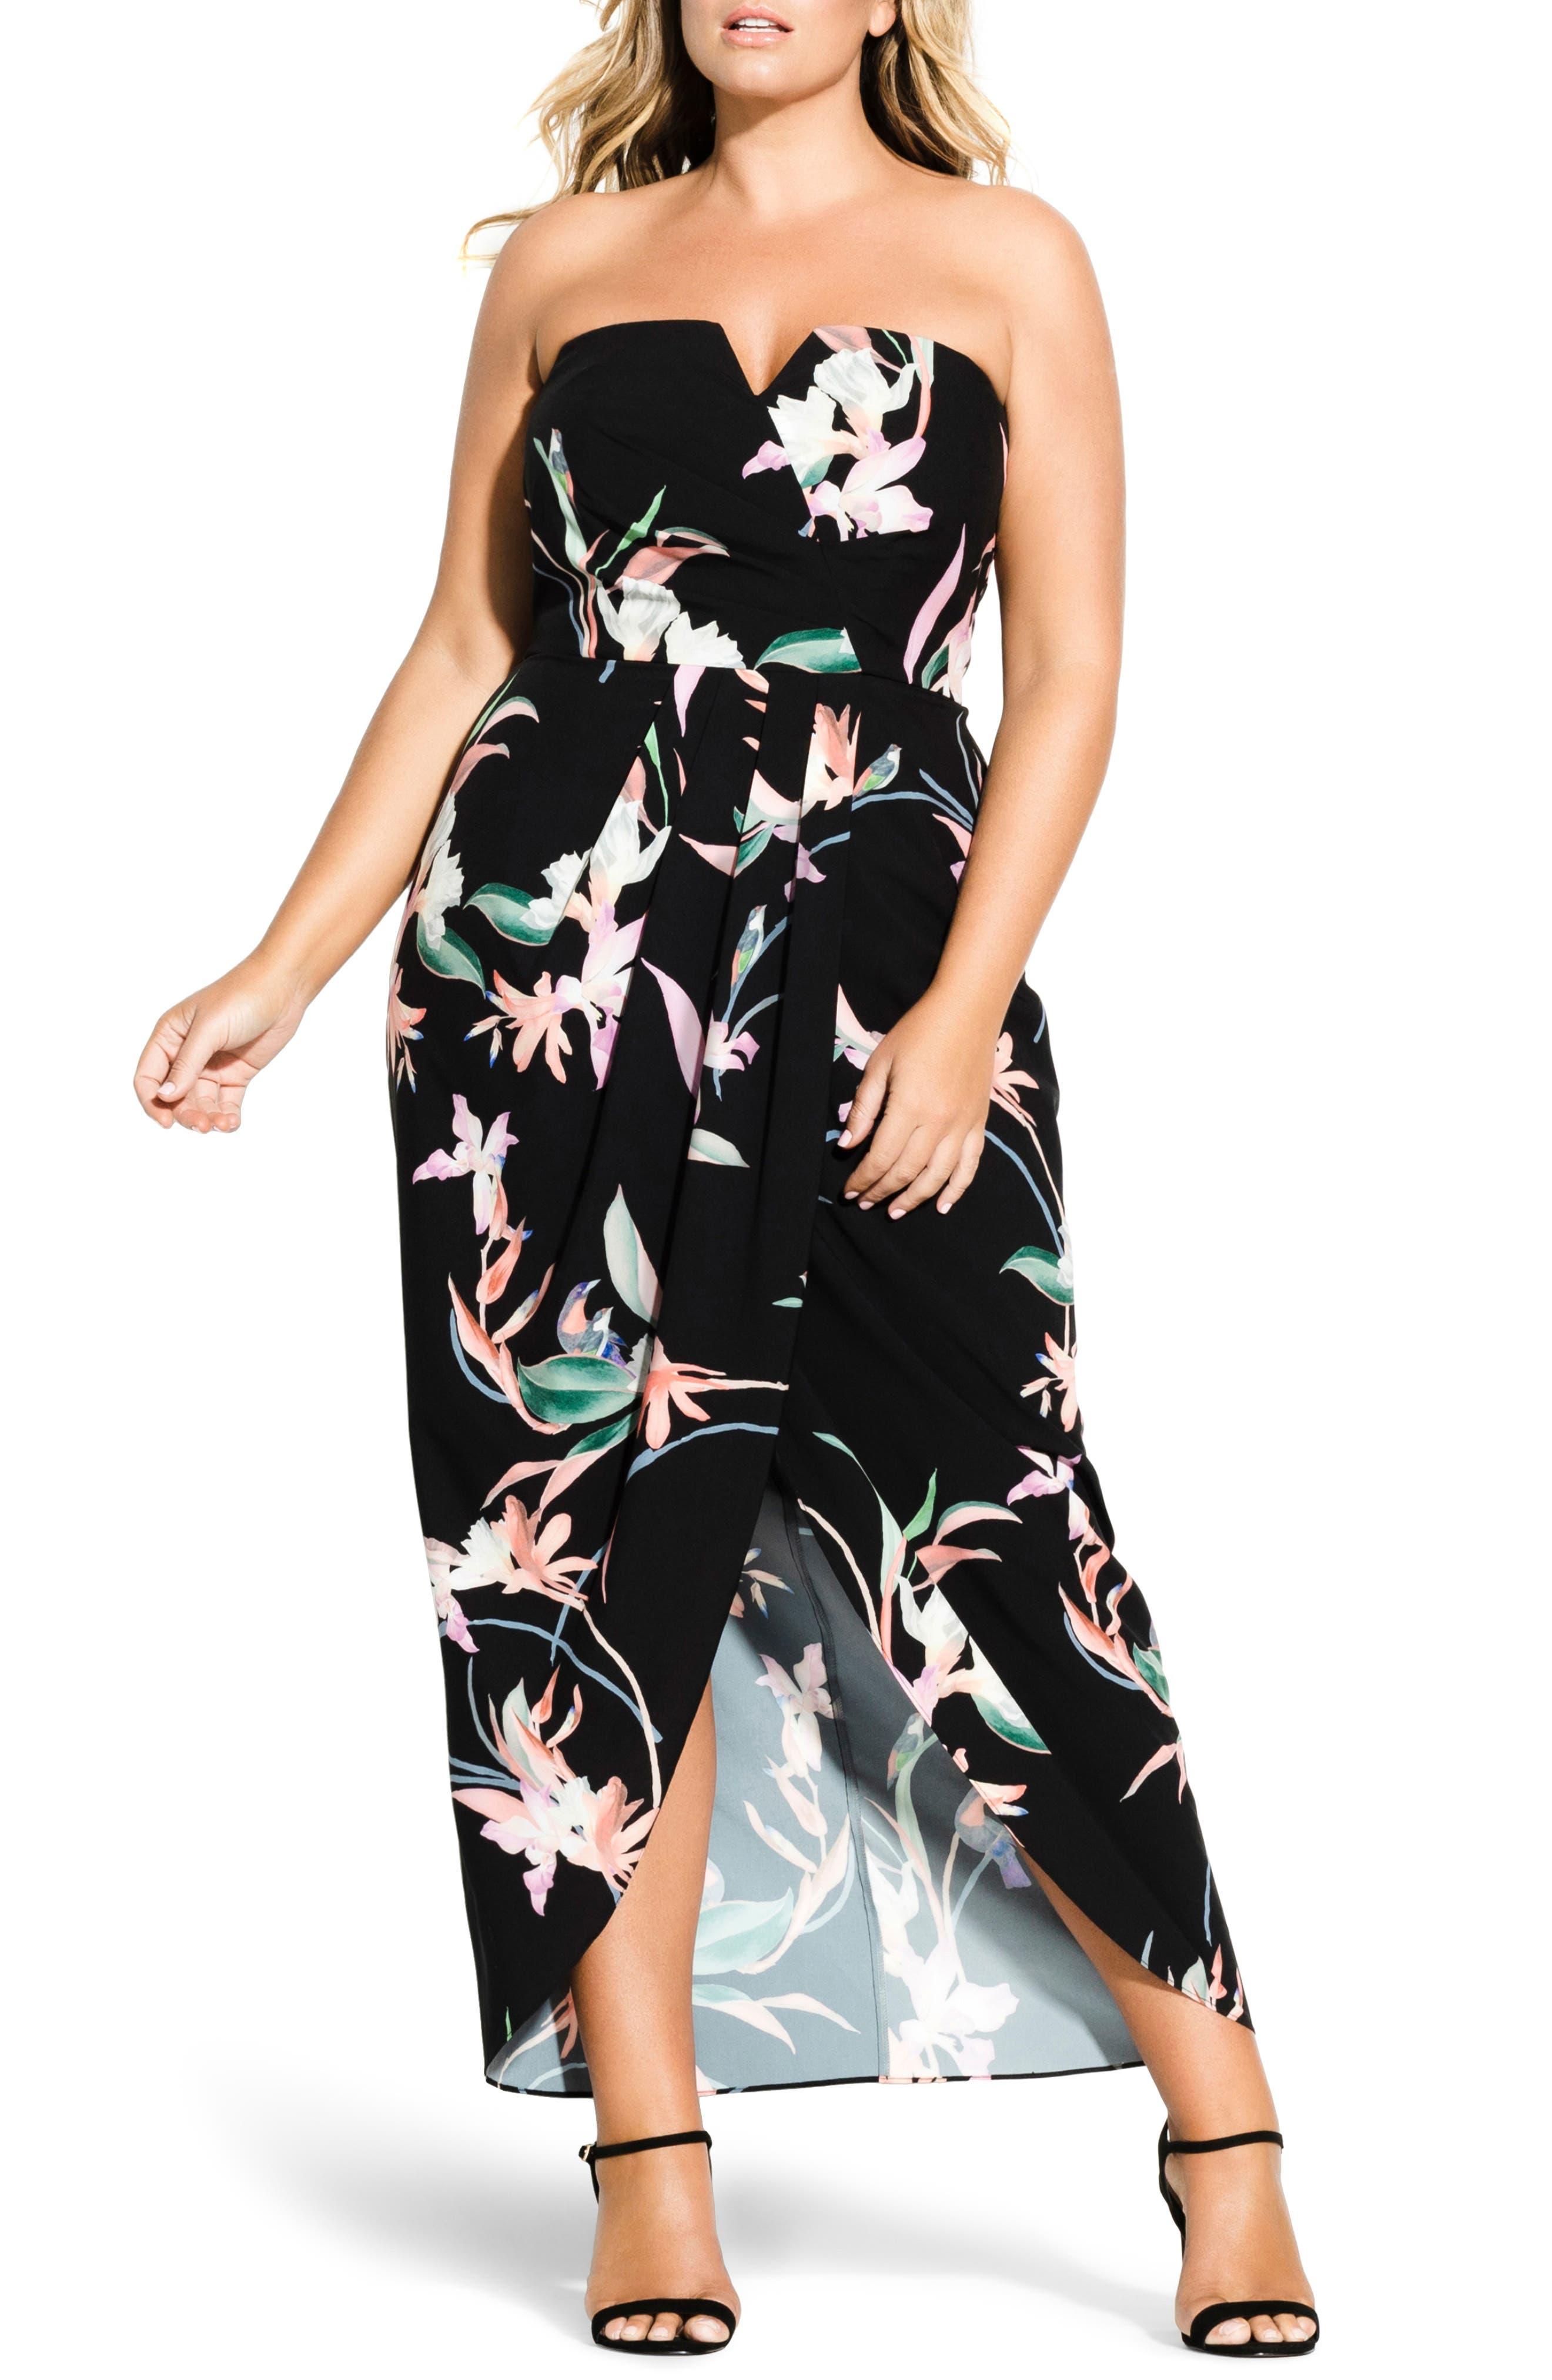 Plus Size City Chic Lovebirds Maxi Dress